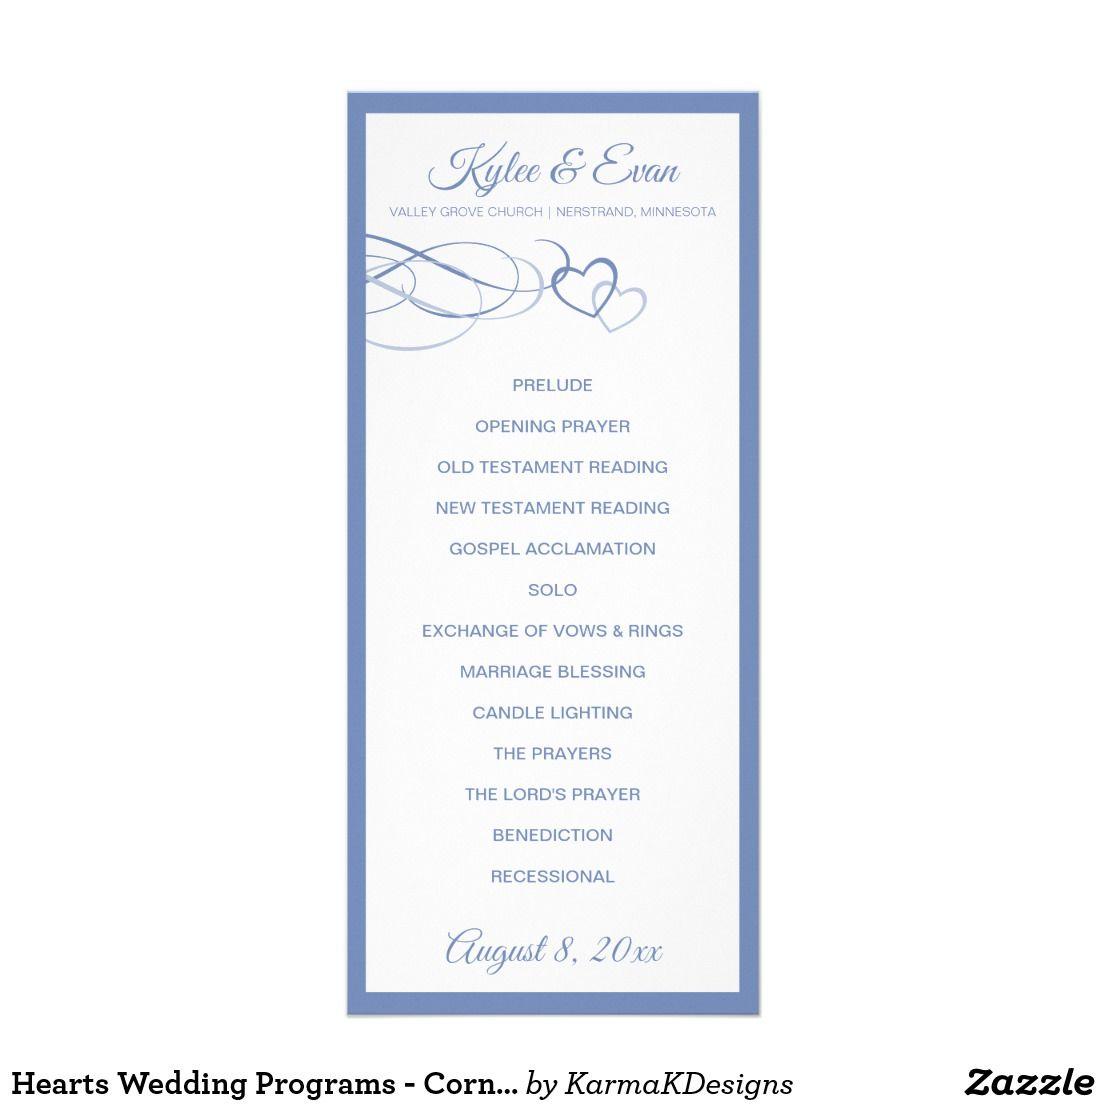 Hearts Wedding Programs - Cornflower Blue-Gray | Wedding programs ...